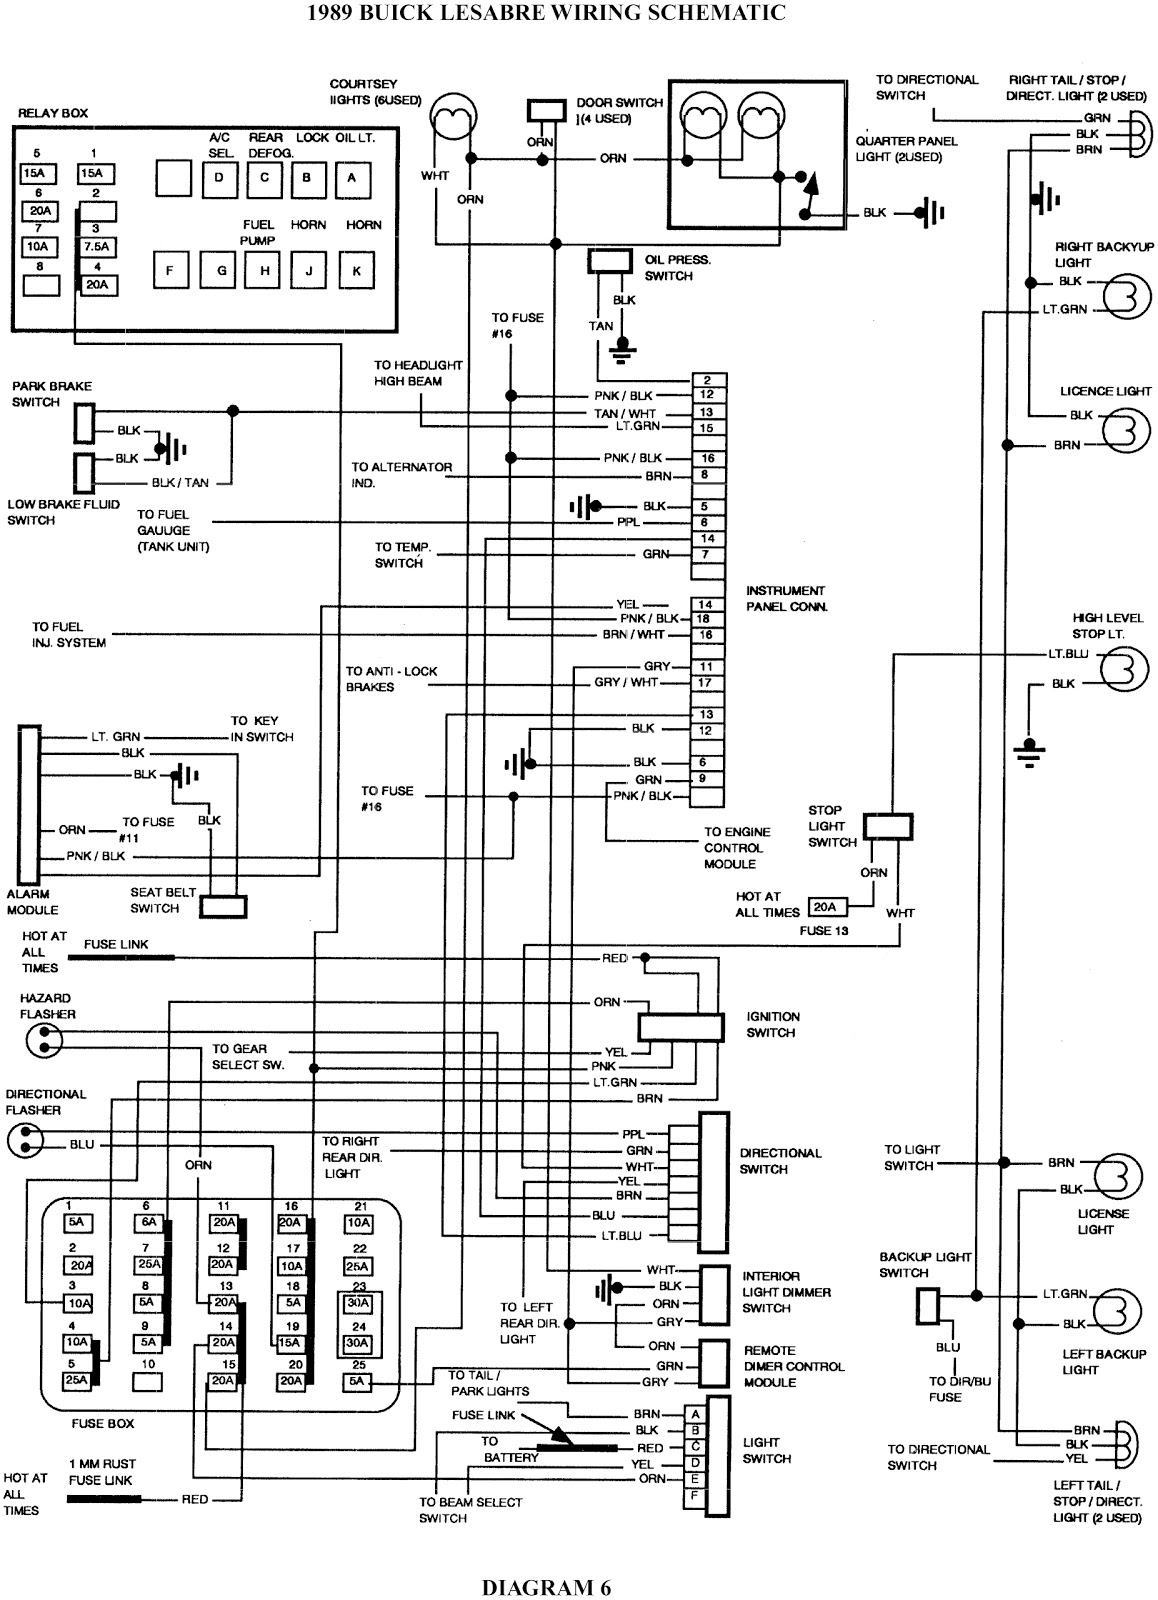 2002 mazda tribute fuse box diagram